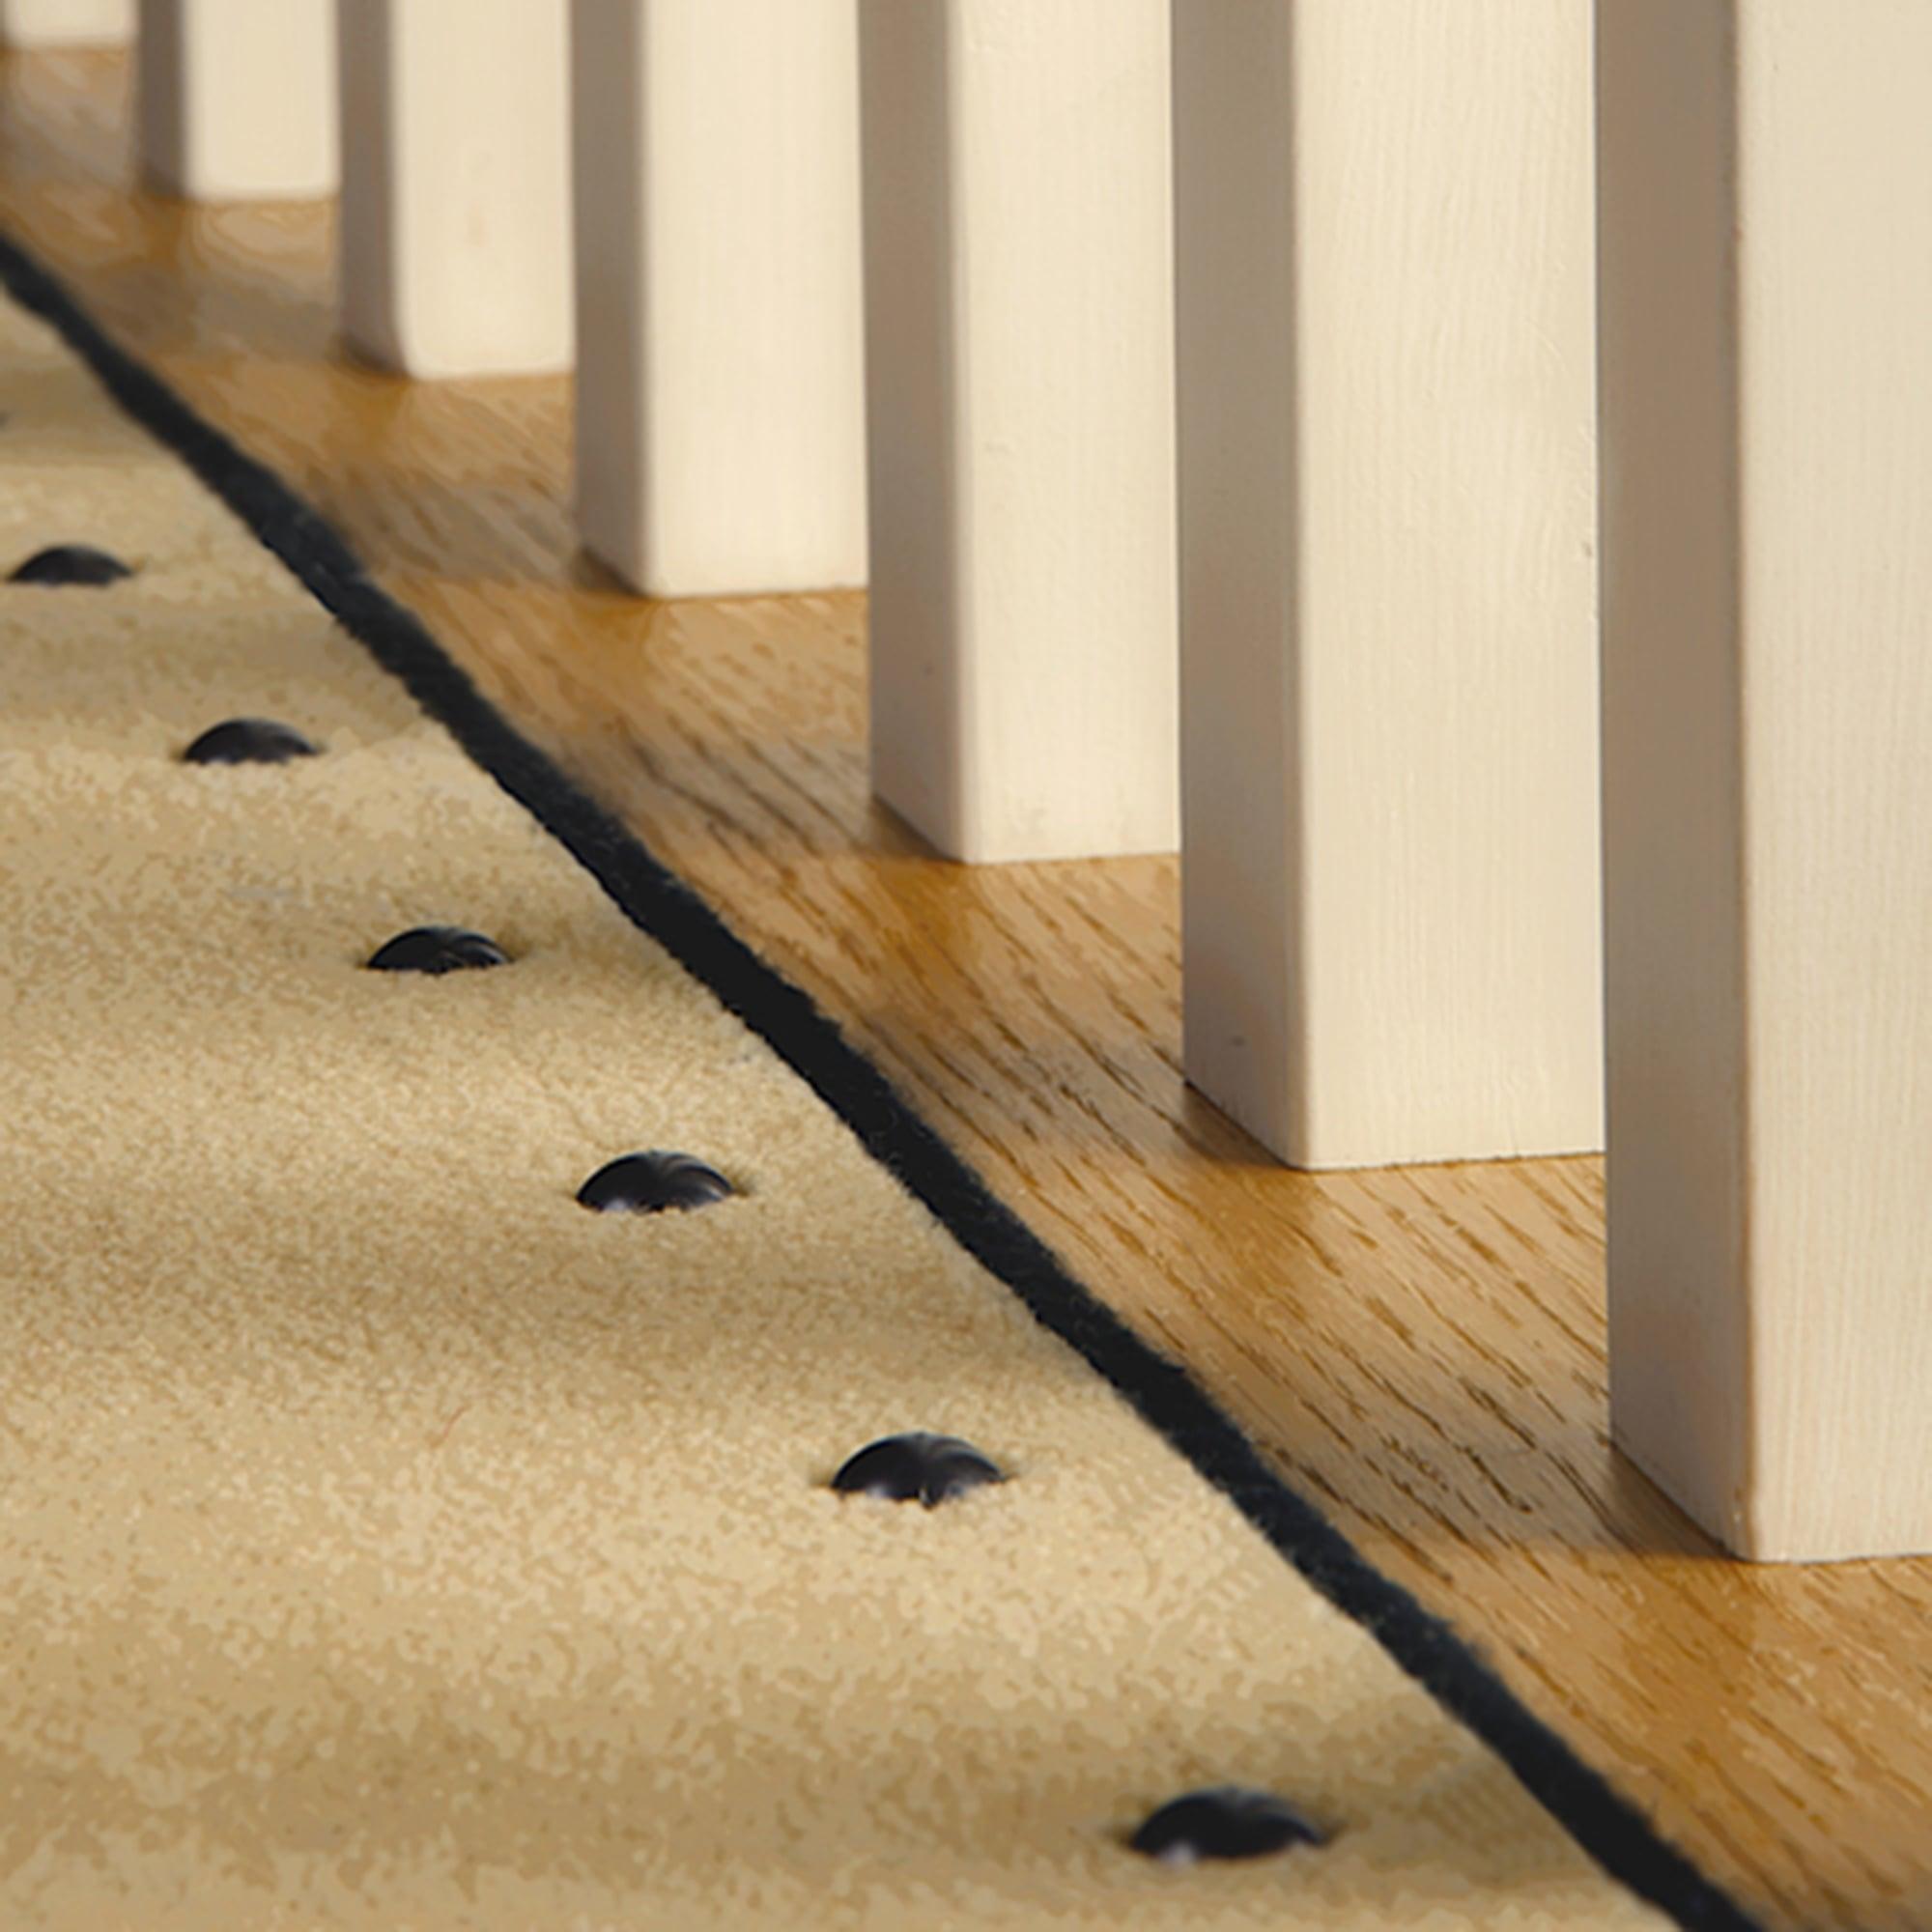 Artistic Stairs Canada: Carpet Sr Runner Canada